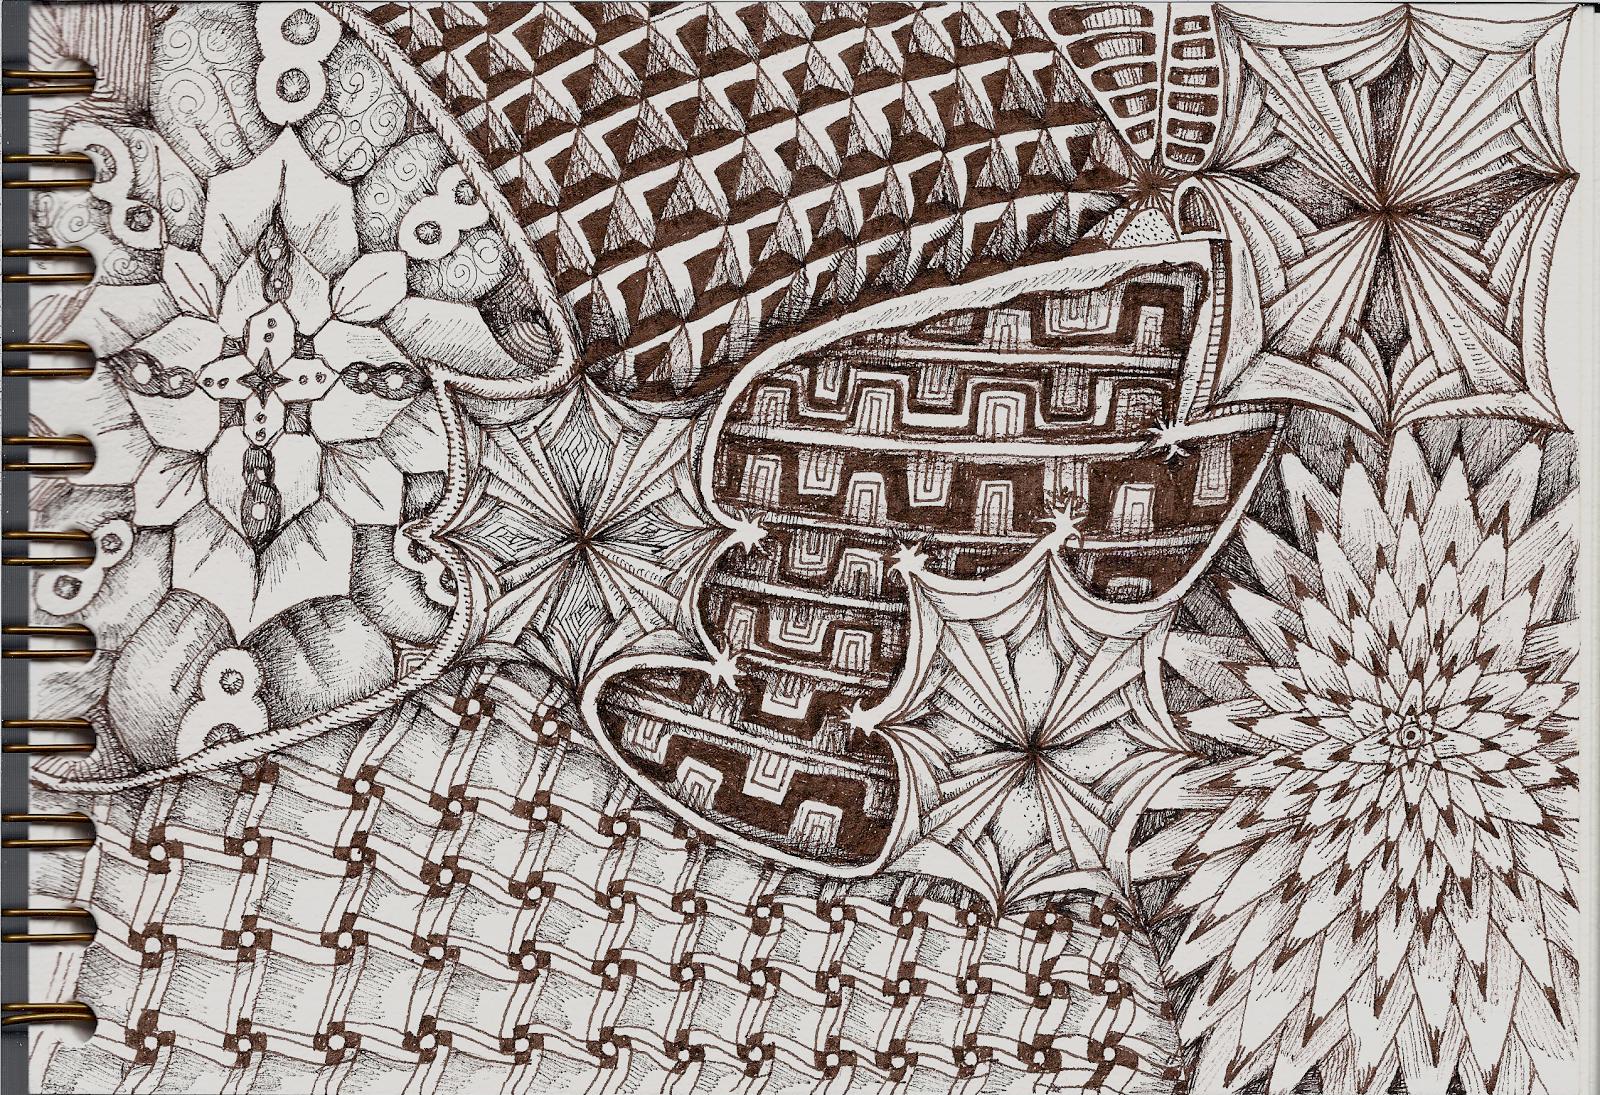 new tangle pattern nolashrim review carnet de voyage. Black Bedroom Furniture Sets. Home Design Ideas